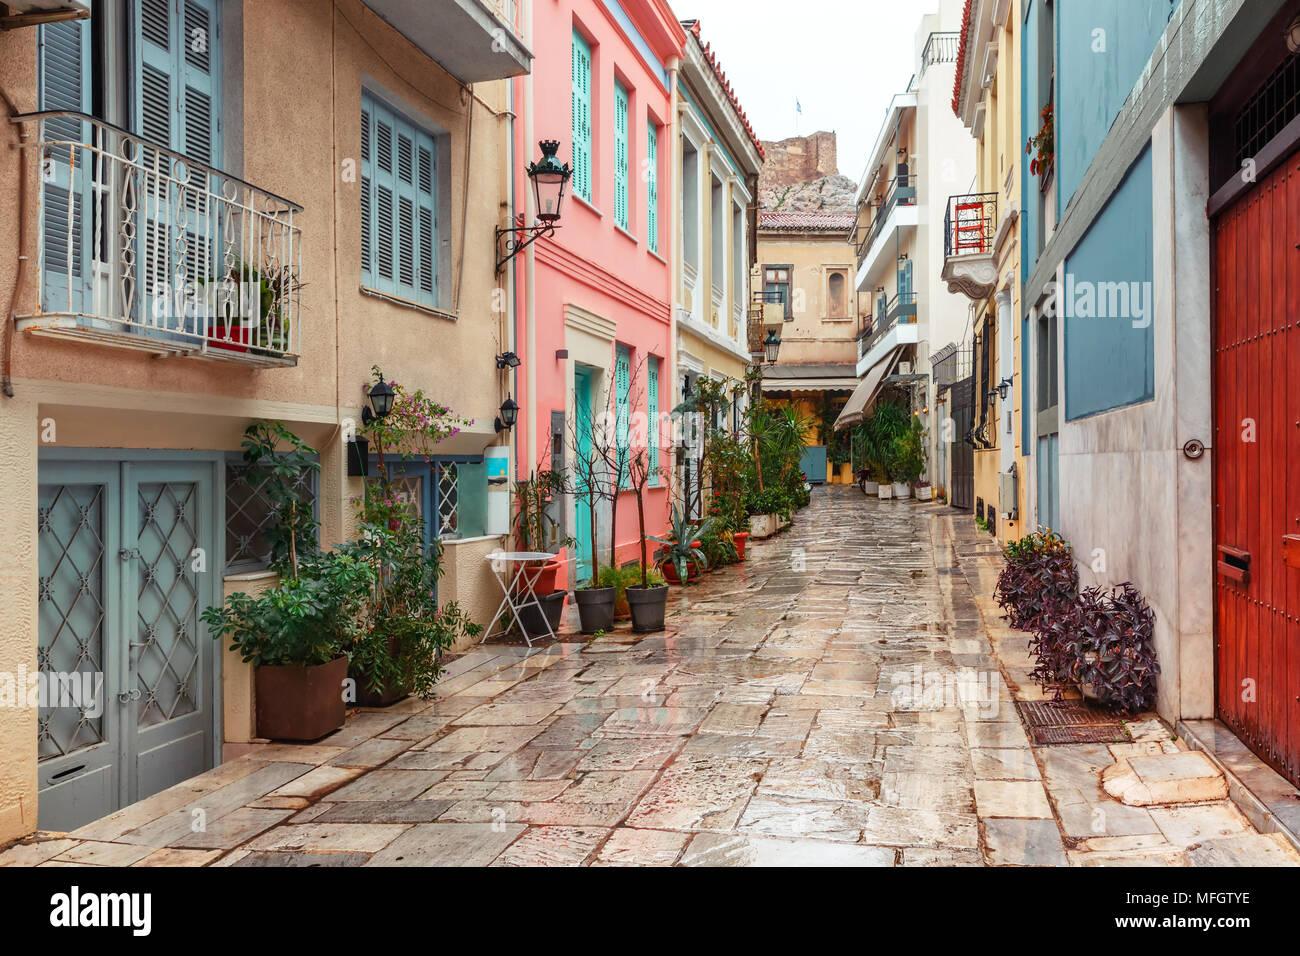 Berühmten Placa Bezirk in Athen, Griechenland Stockbild